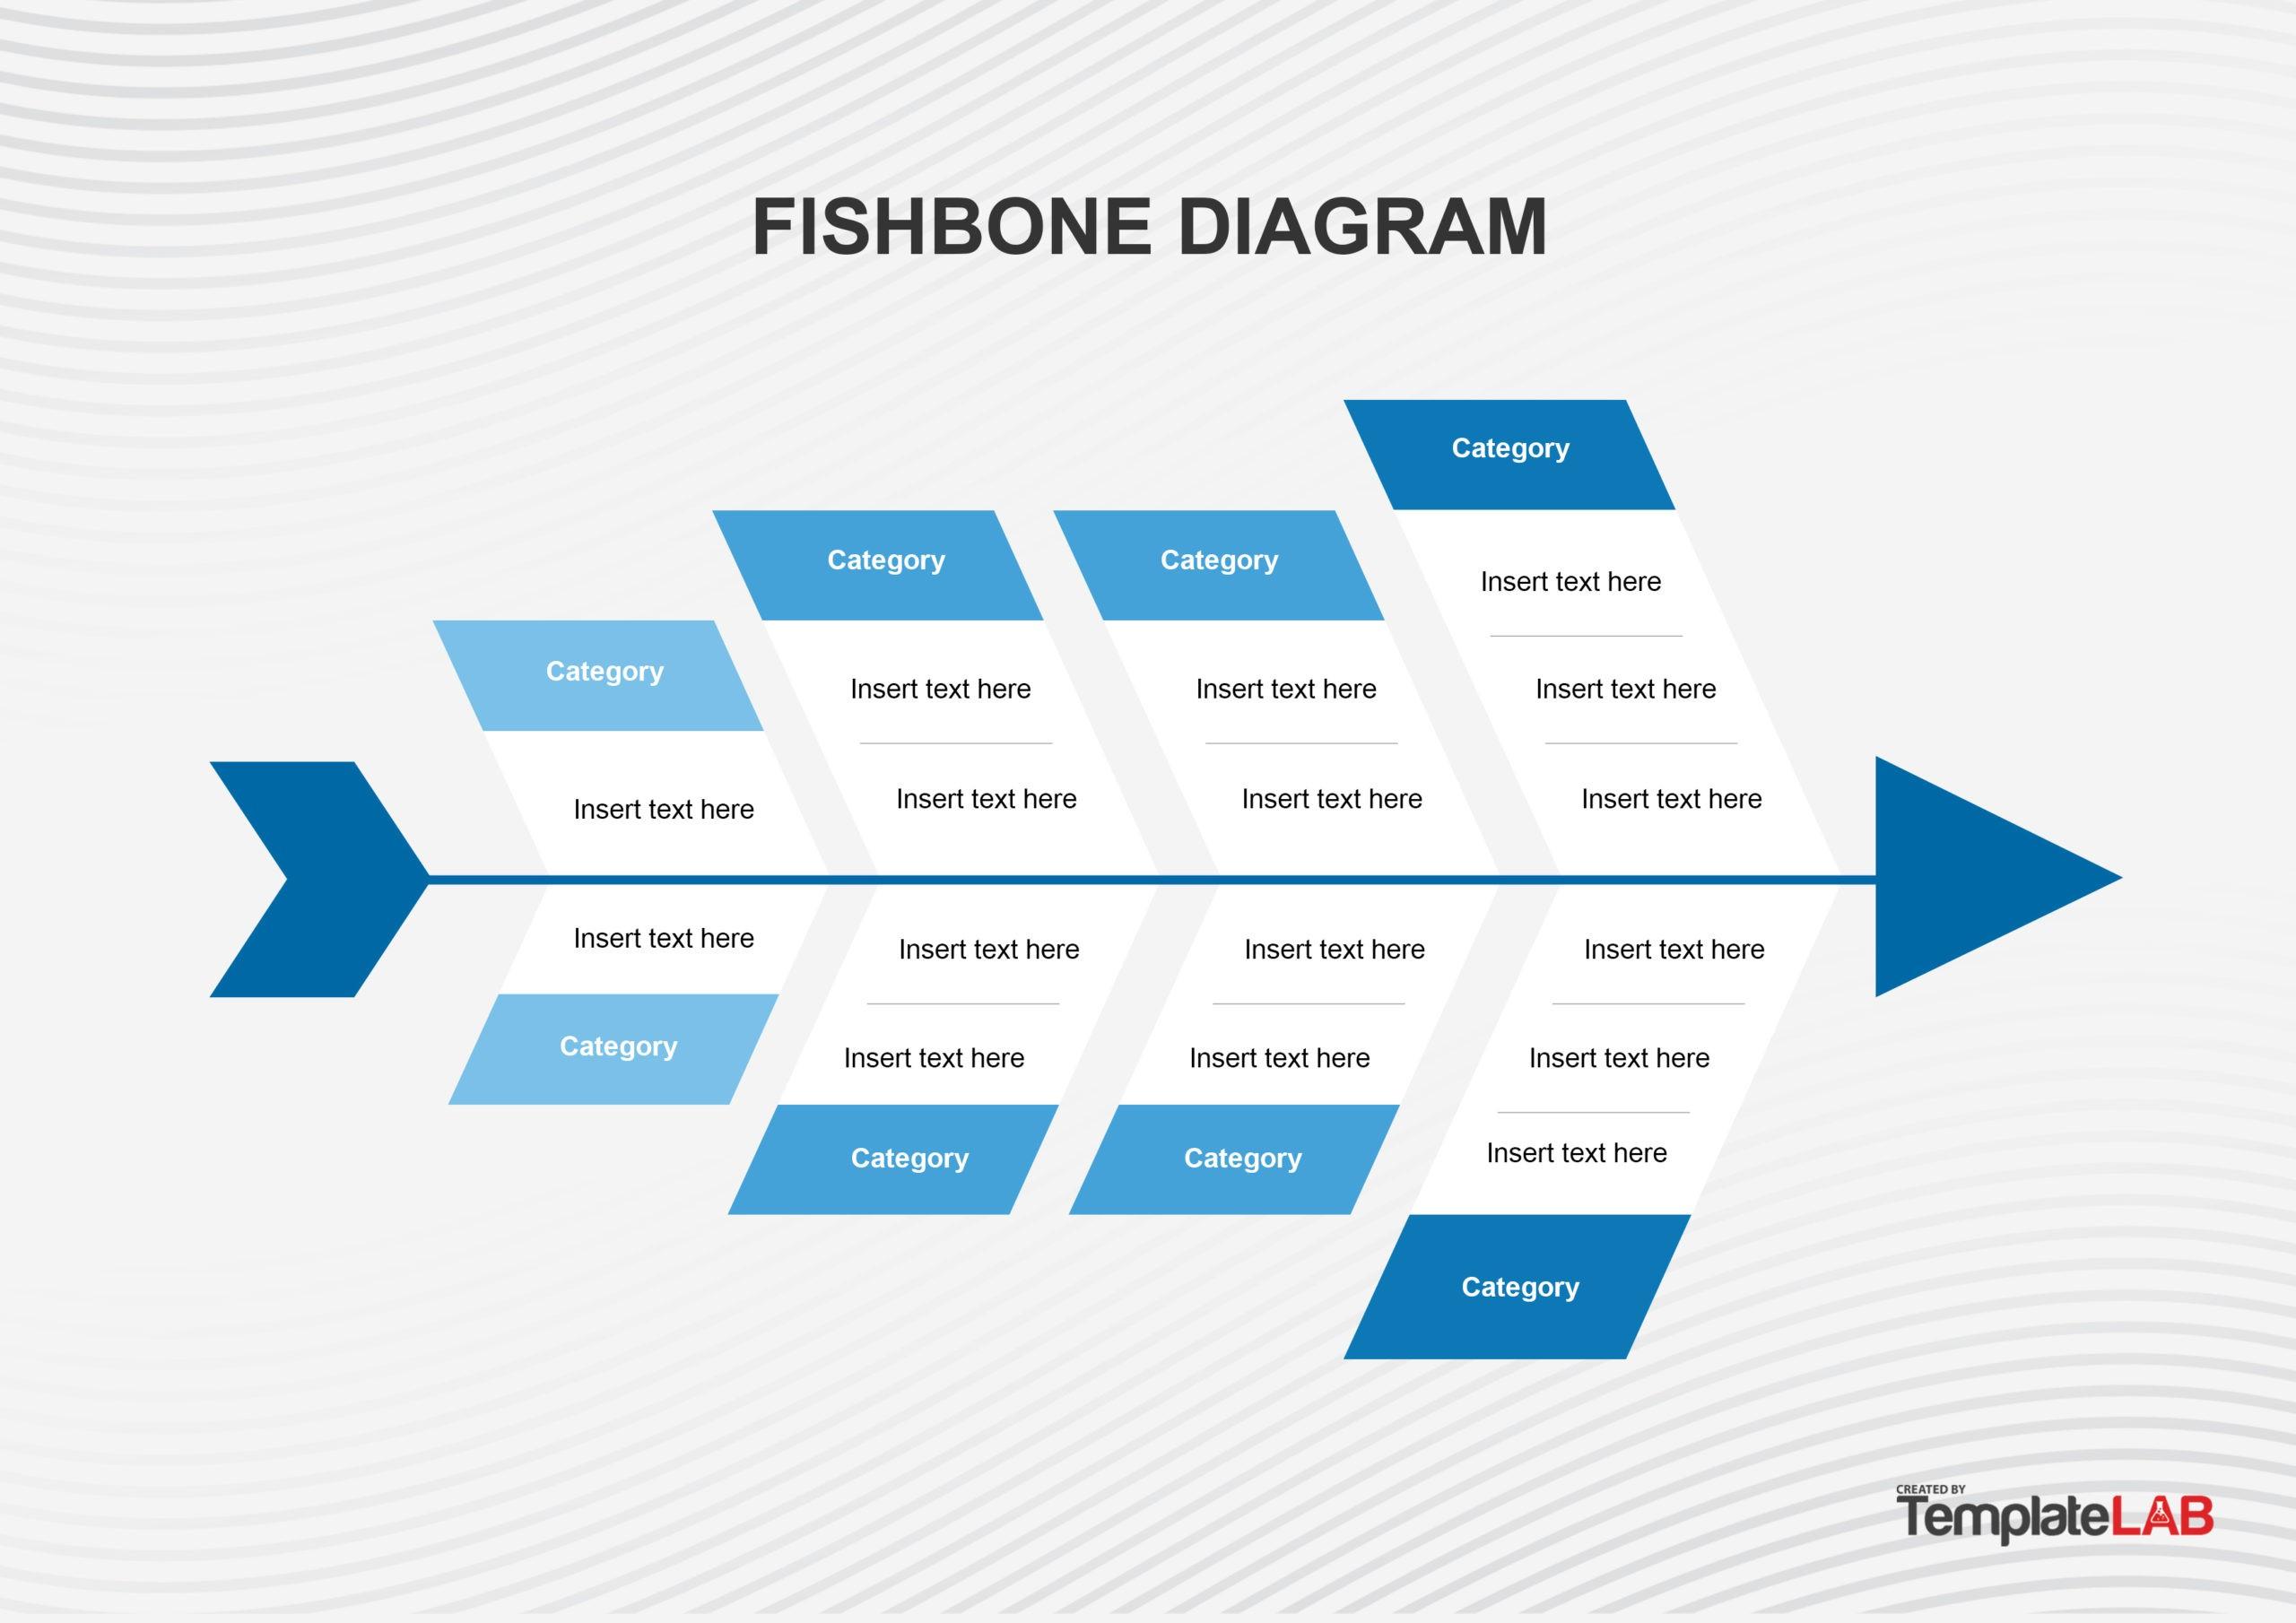 Free Fishbone Diagram Template 08 - TemplateLab.com